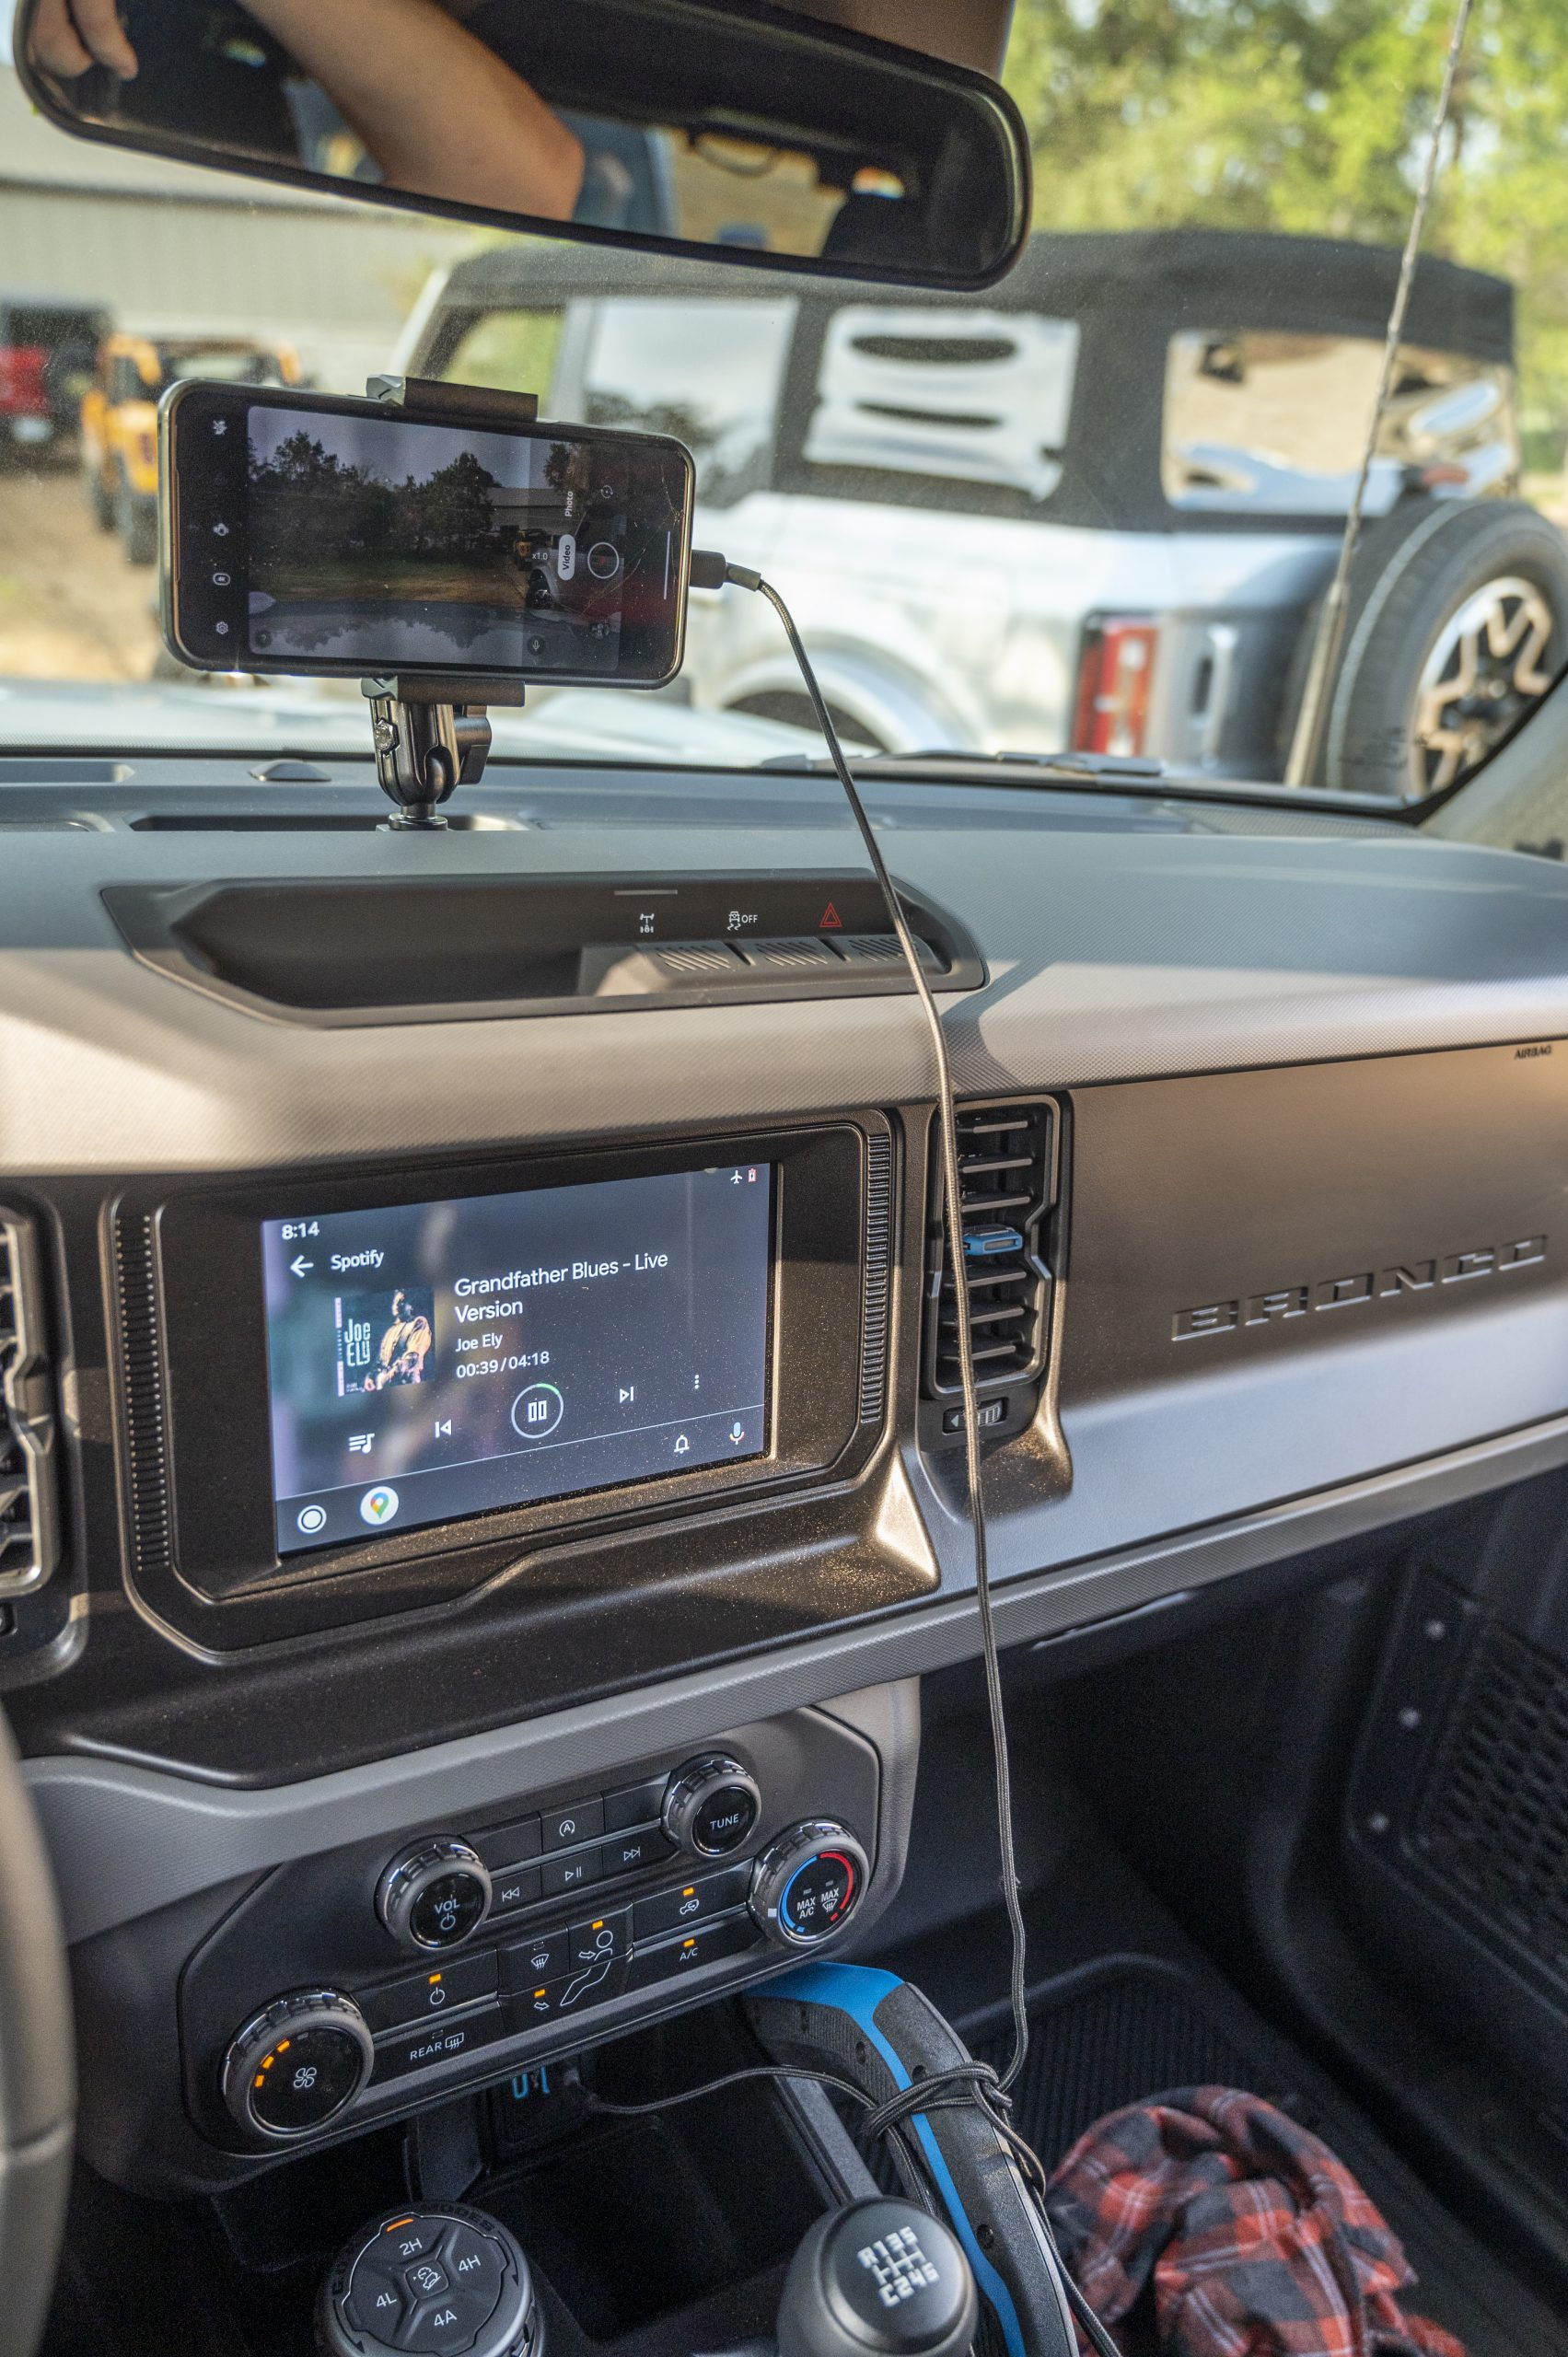 2021 Ford Bronco interior phone mount vertical